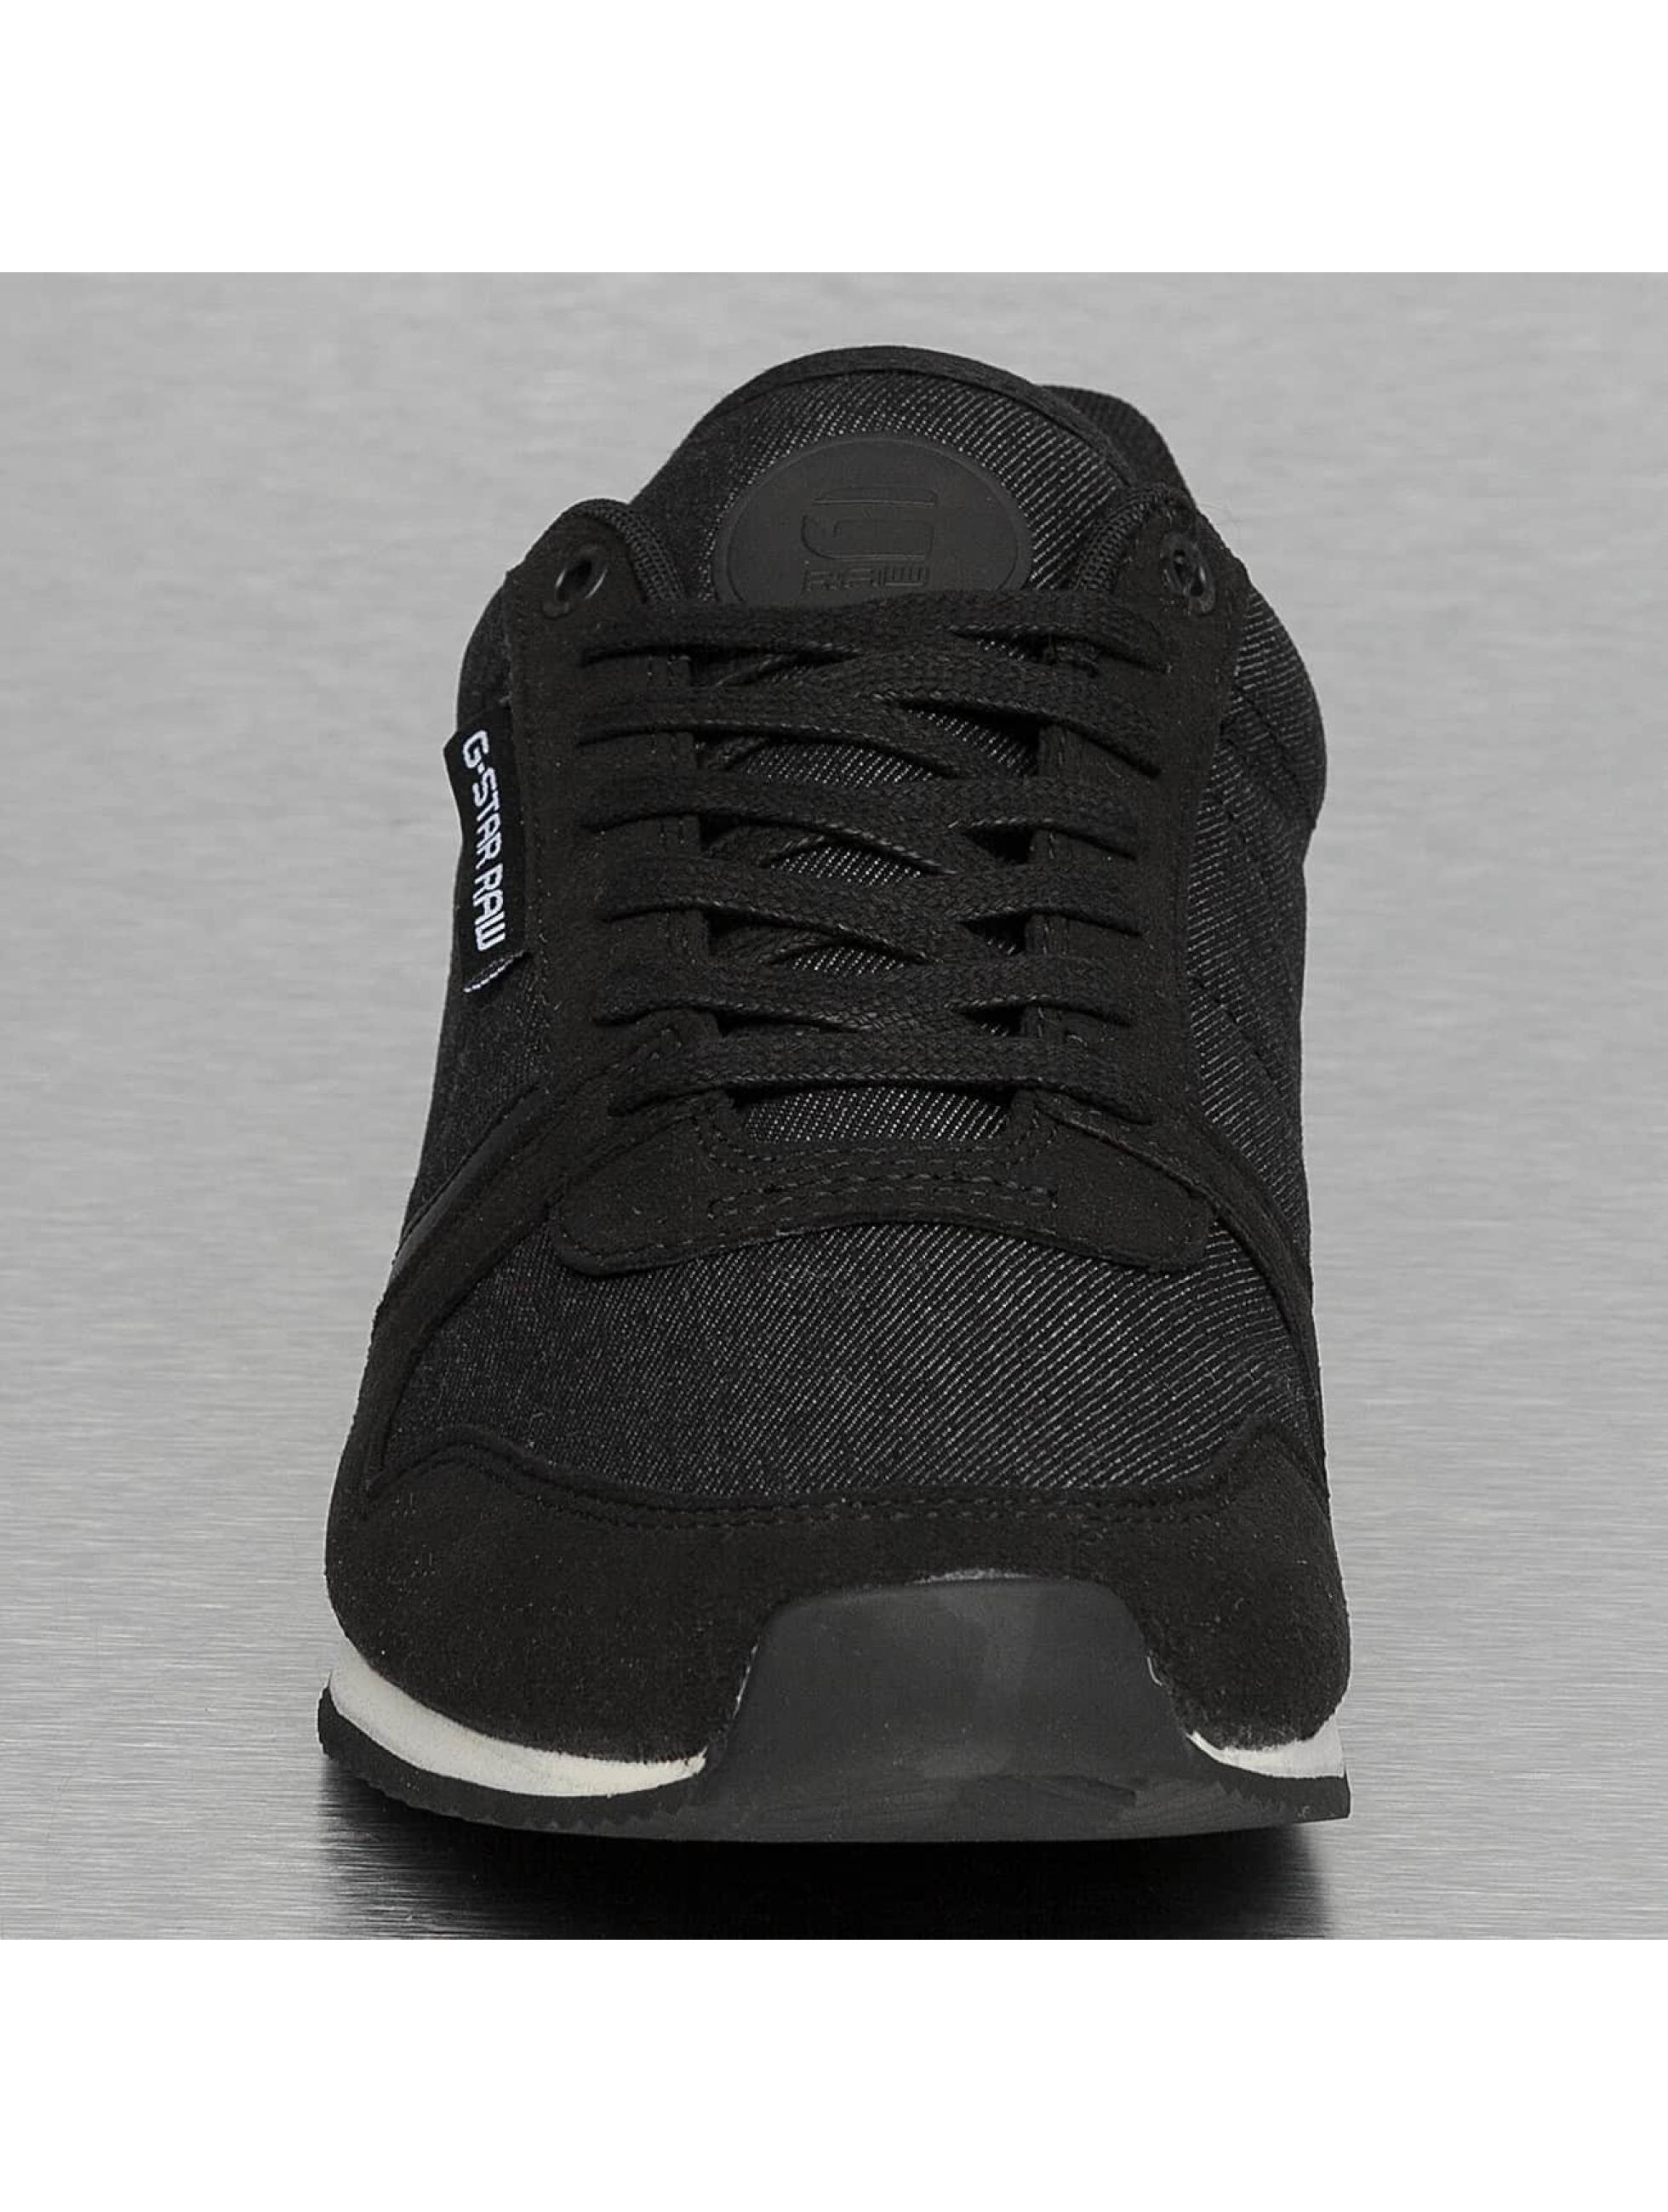 G-Star Sneaker Turner schwarz